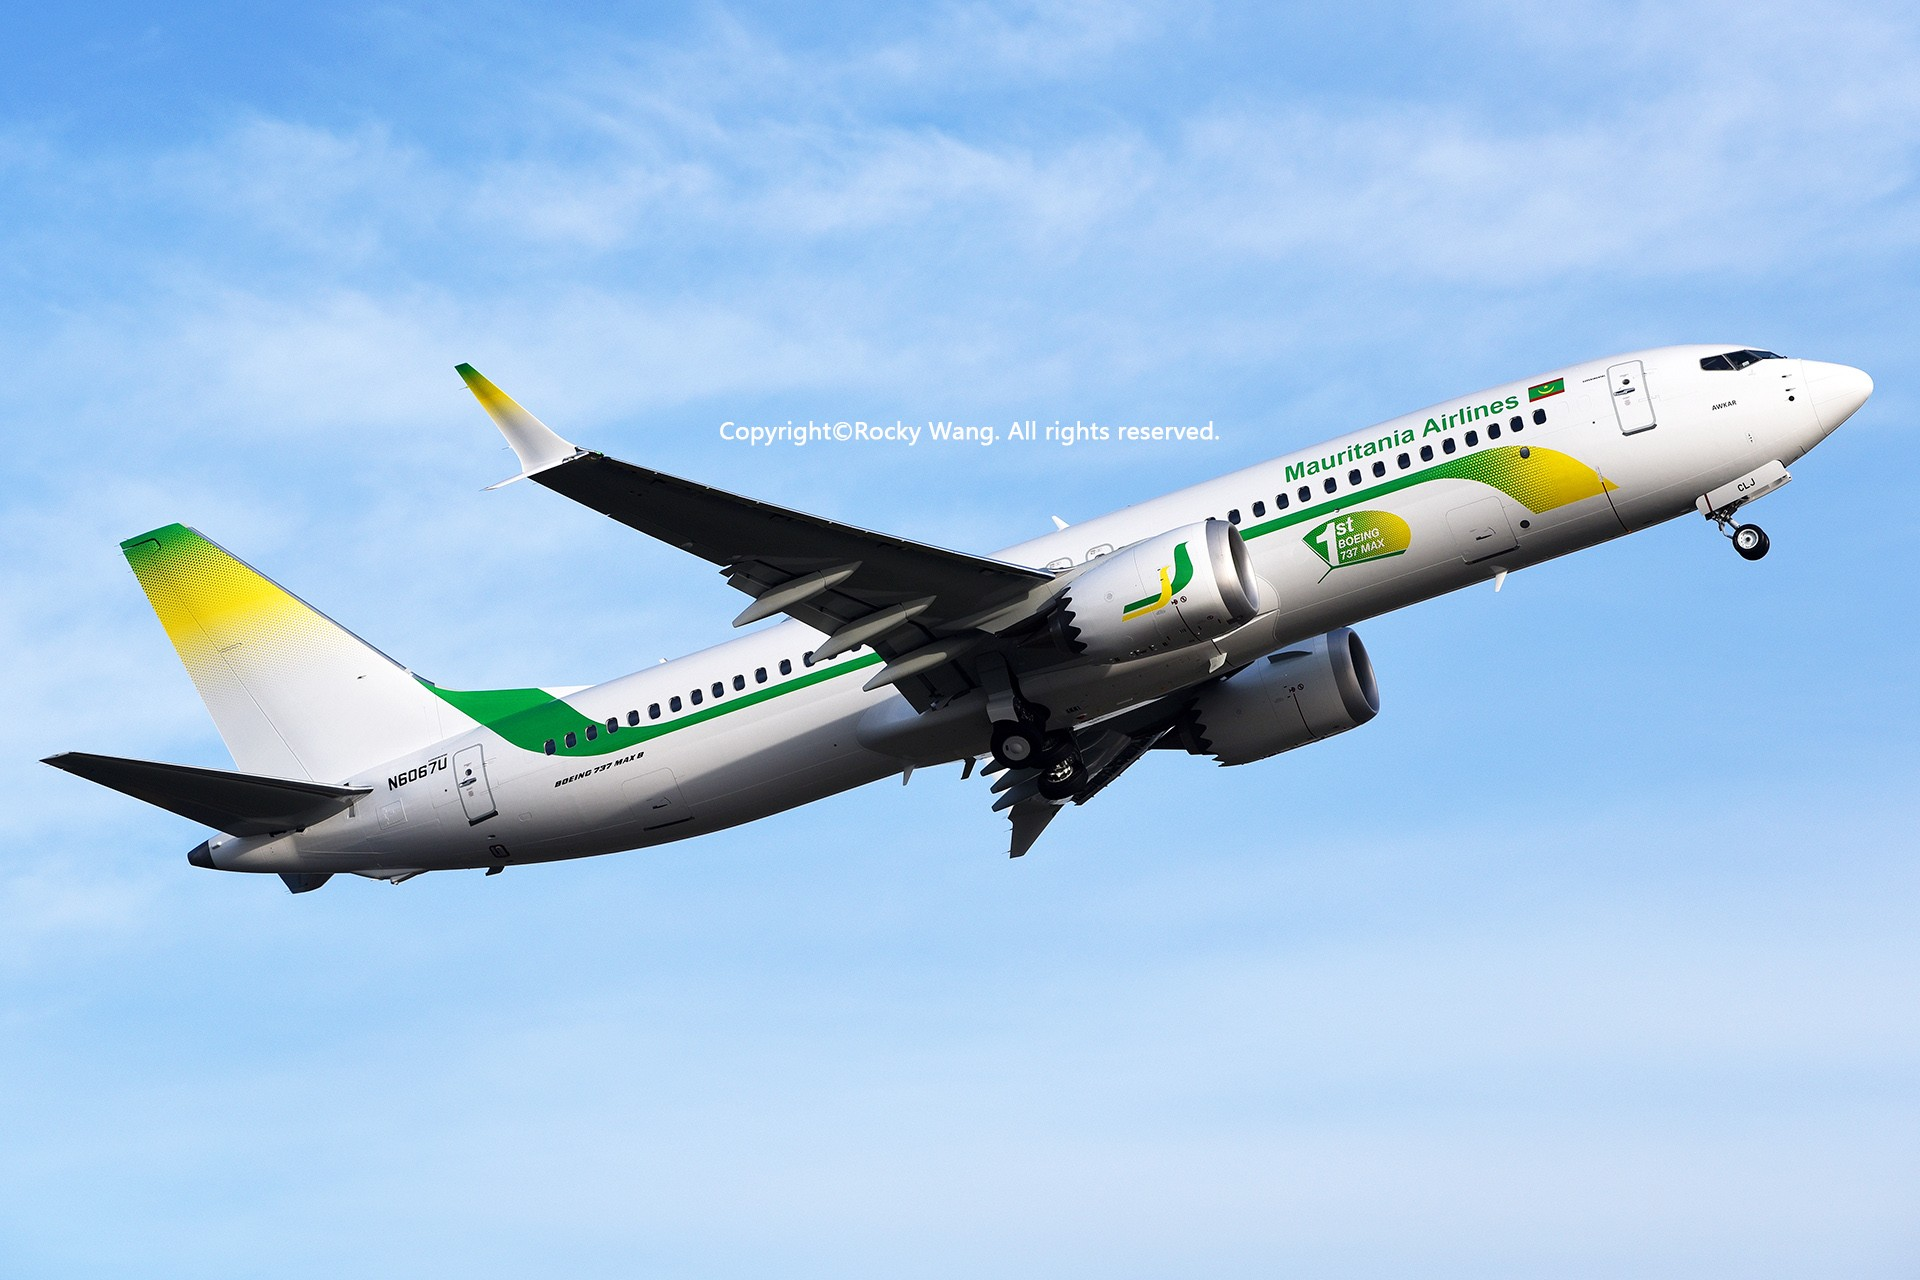 Re:[原创]Seattle 30图 BOEING 737-8 MAX N6067U Seattle Boeing Field/King County